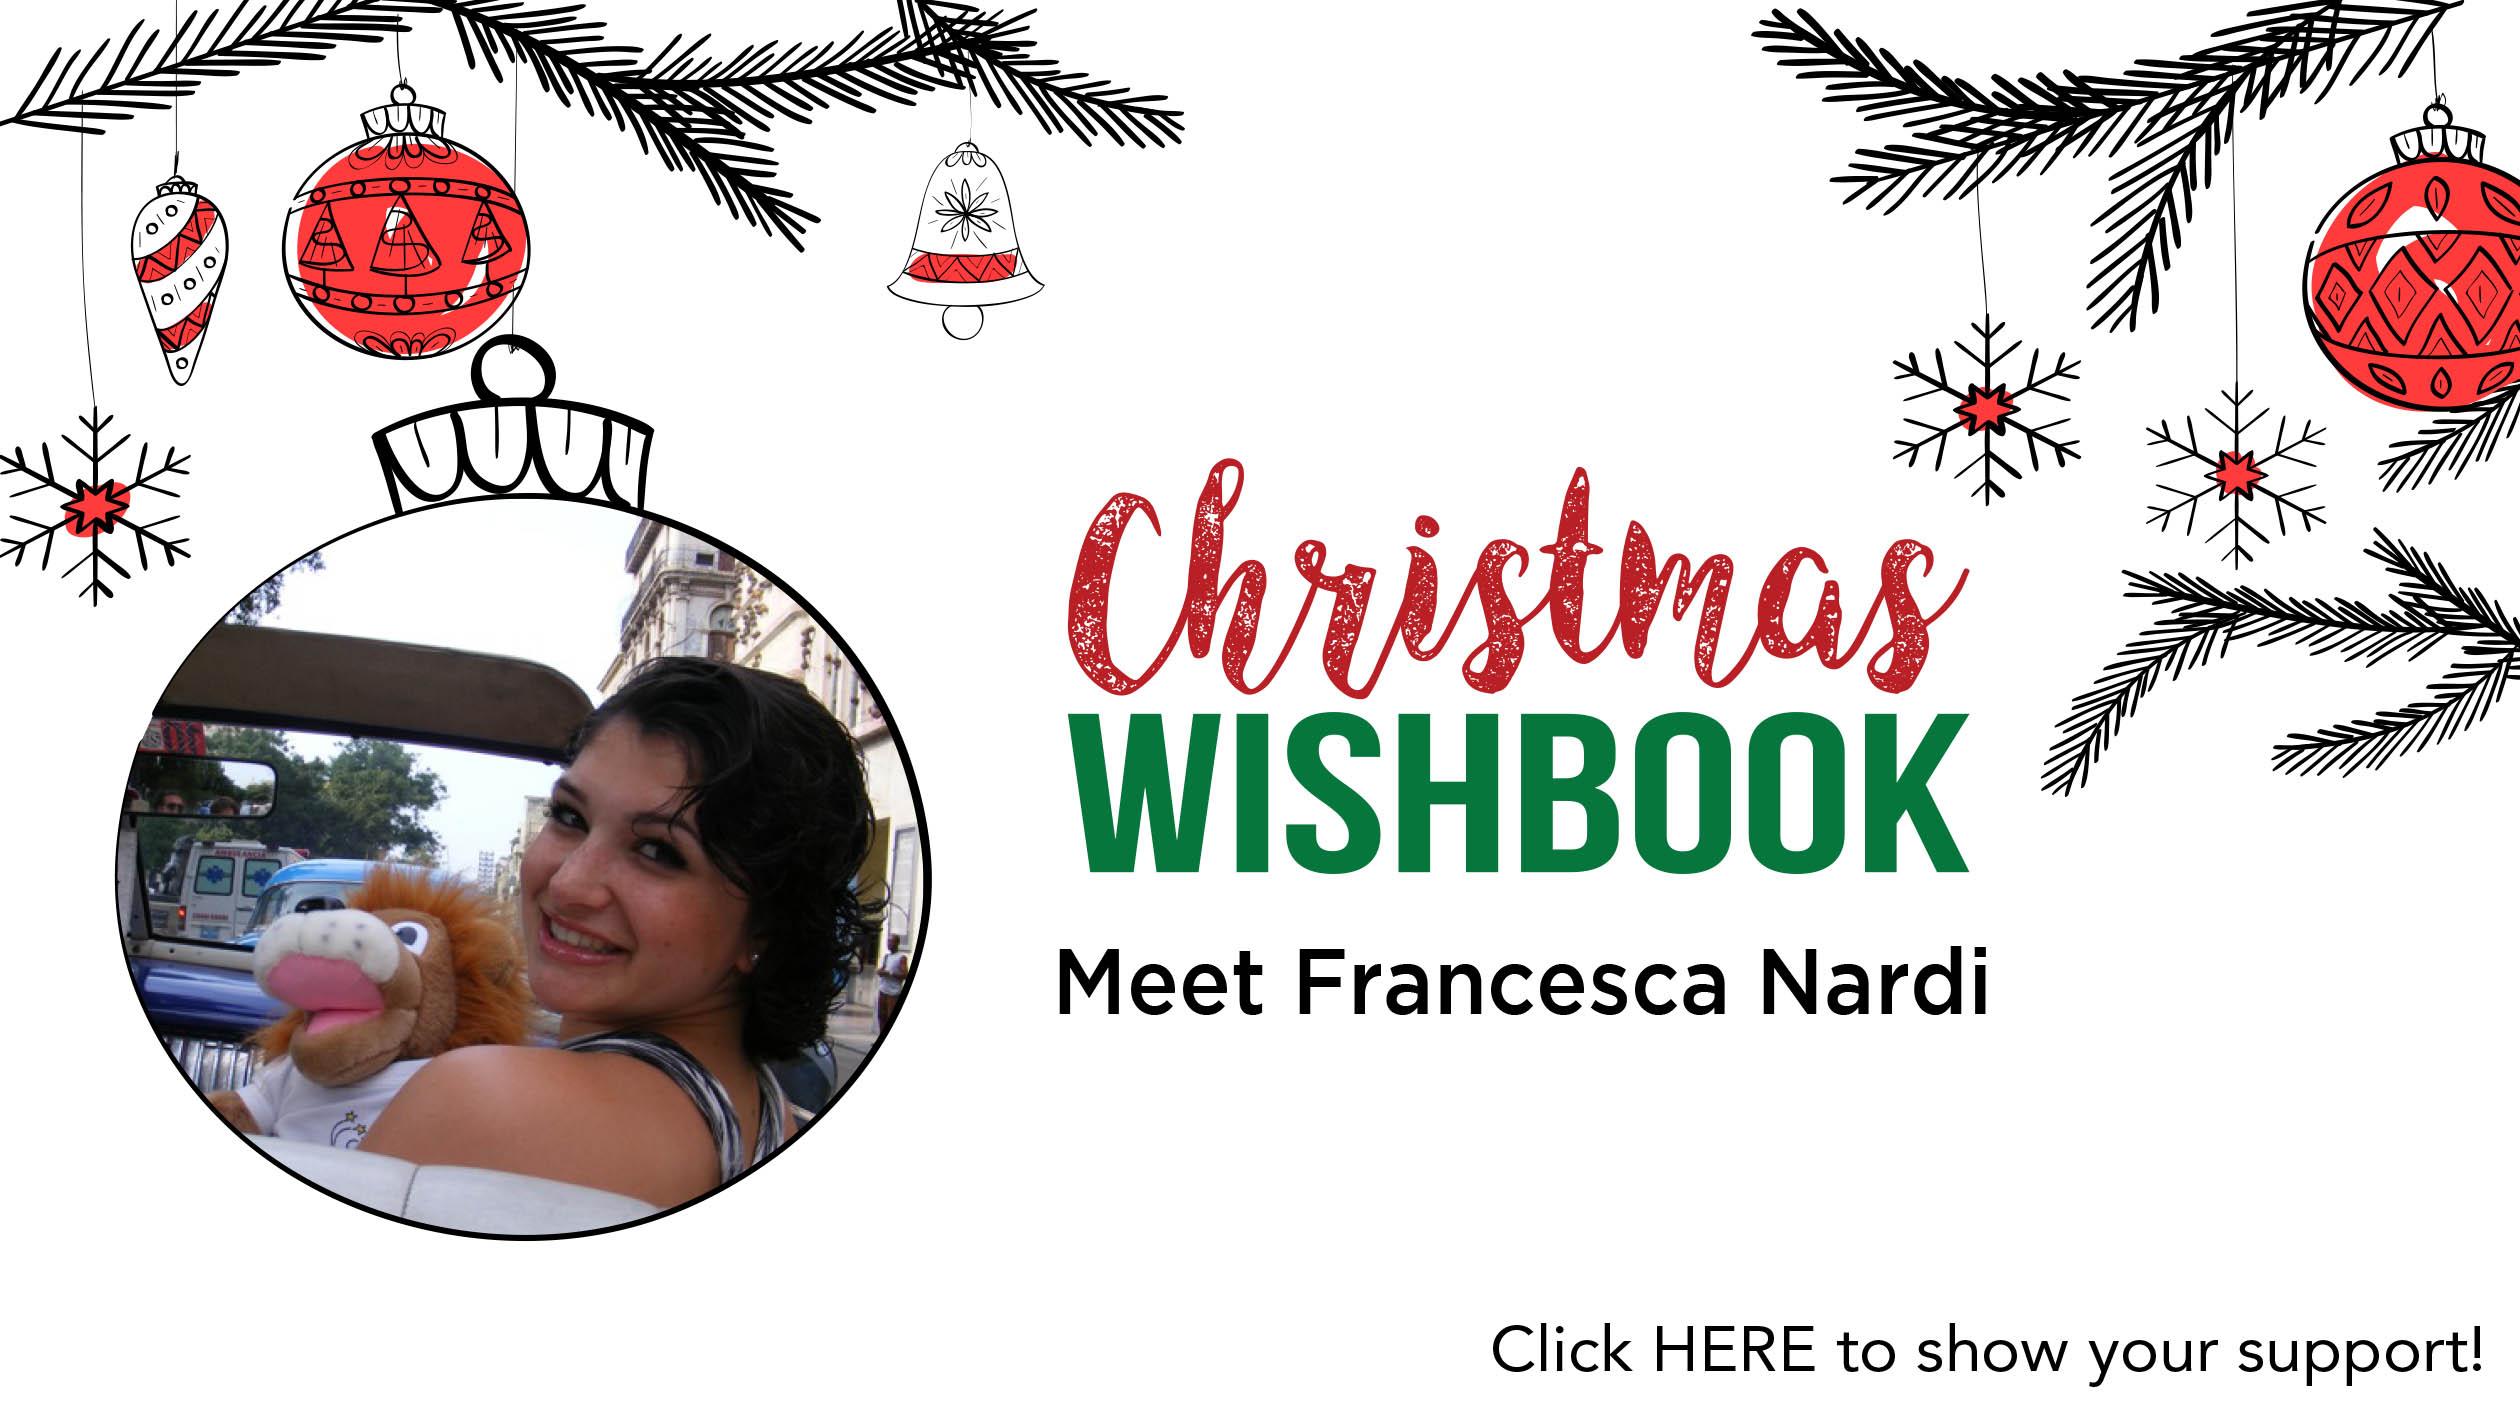 Feature: https://www.mix965.ca/christmas_wishbook/?fbclid=IwAR2i3fVhPdHZdSQz2TTVRe2fjRylFGu44SIwb9rp_WaF2TnJn0sWfj5ChcMhttps://www.mix965.ca/christmas_wishbook/